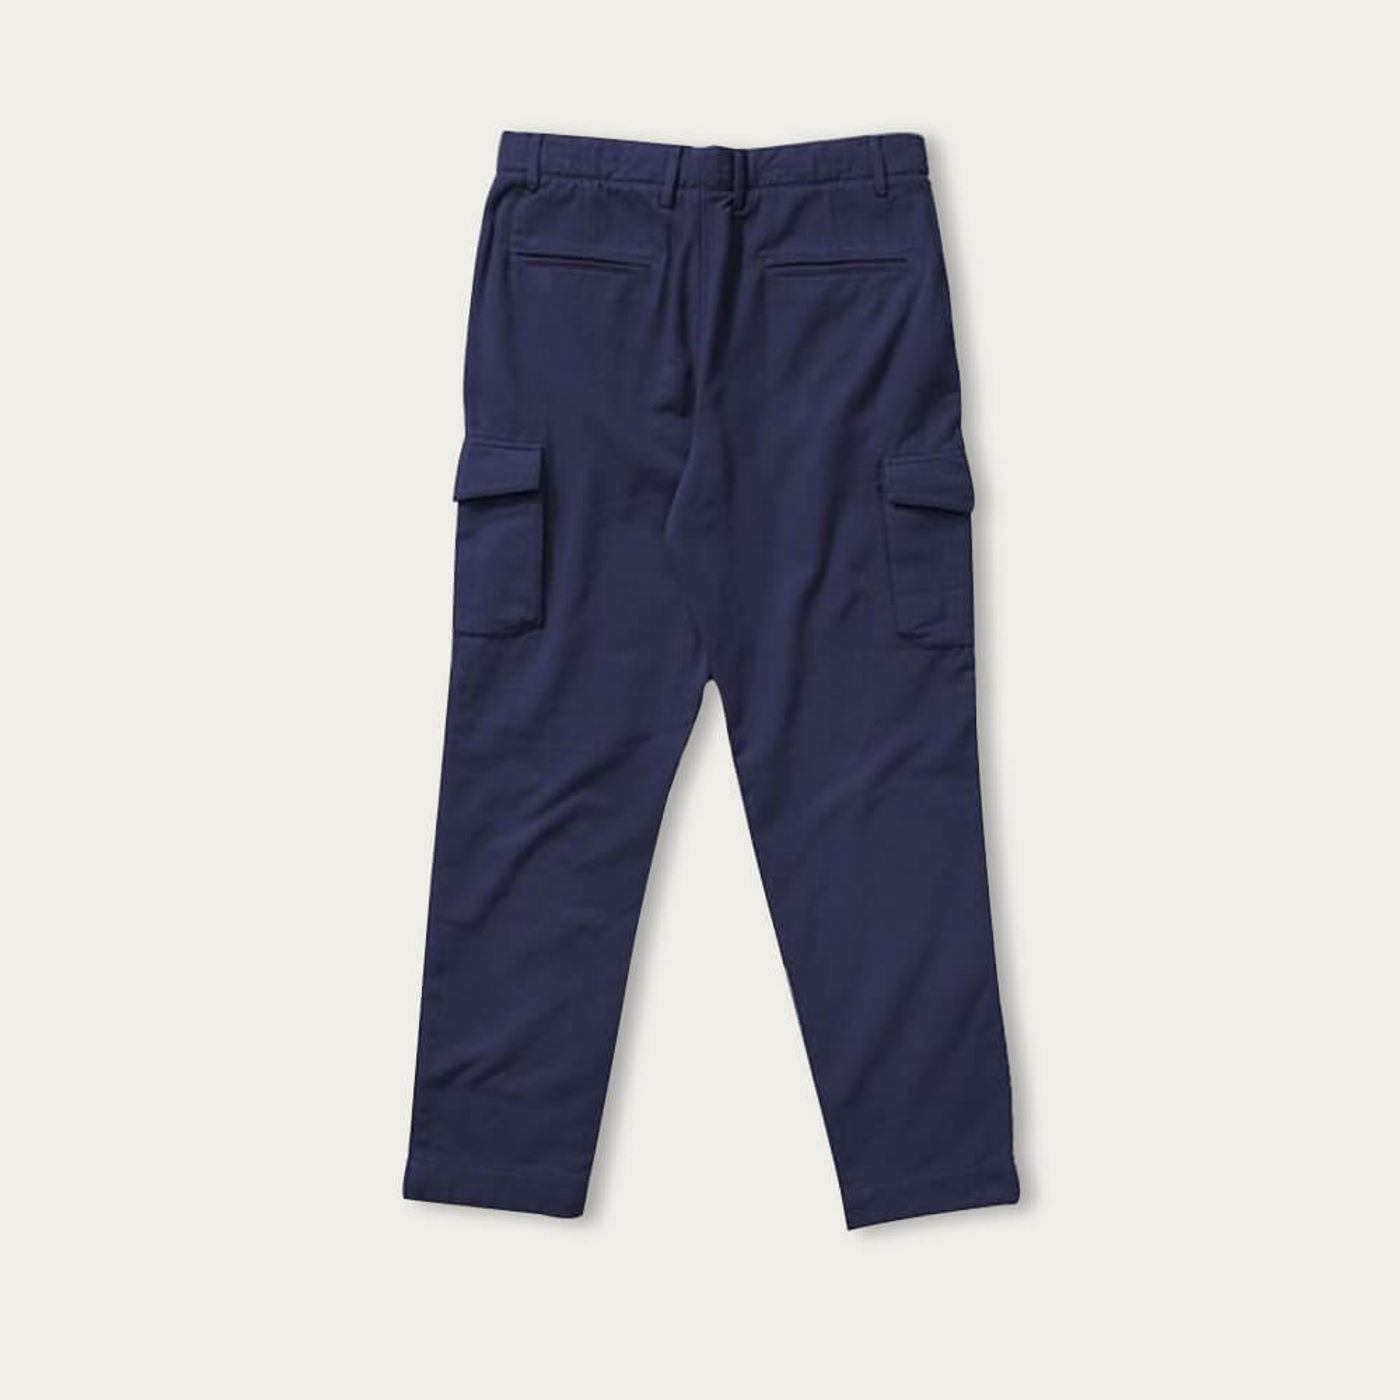 Navy Relaxed Owen Cargo Pants   Bombinate